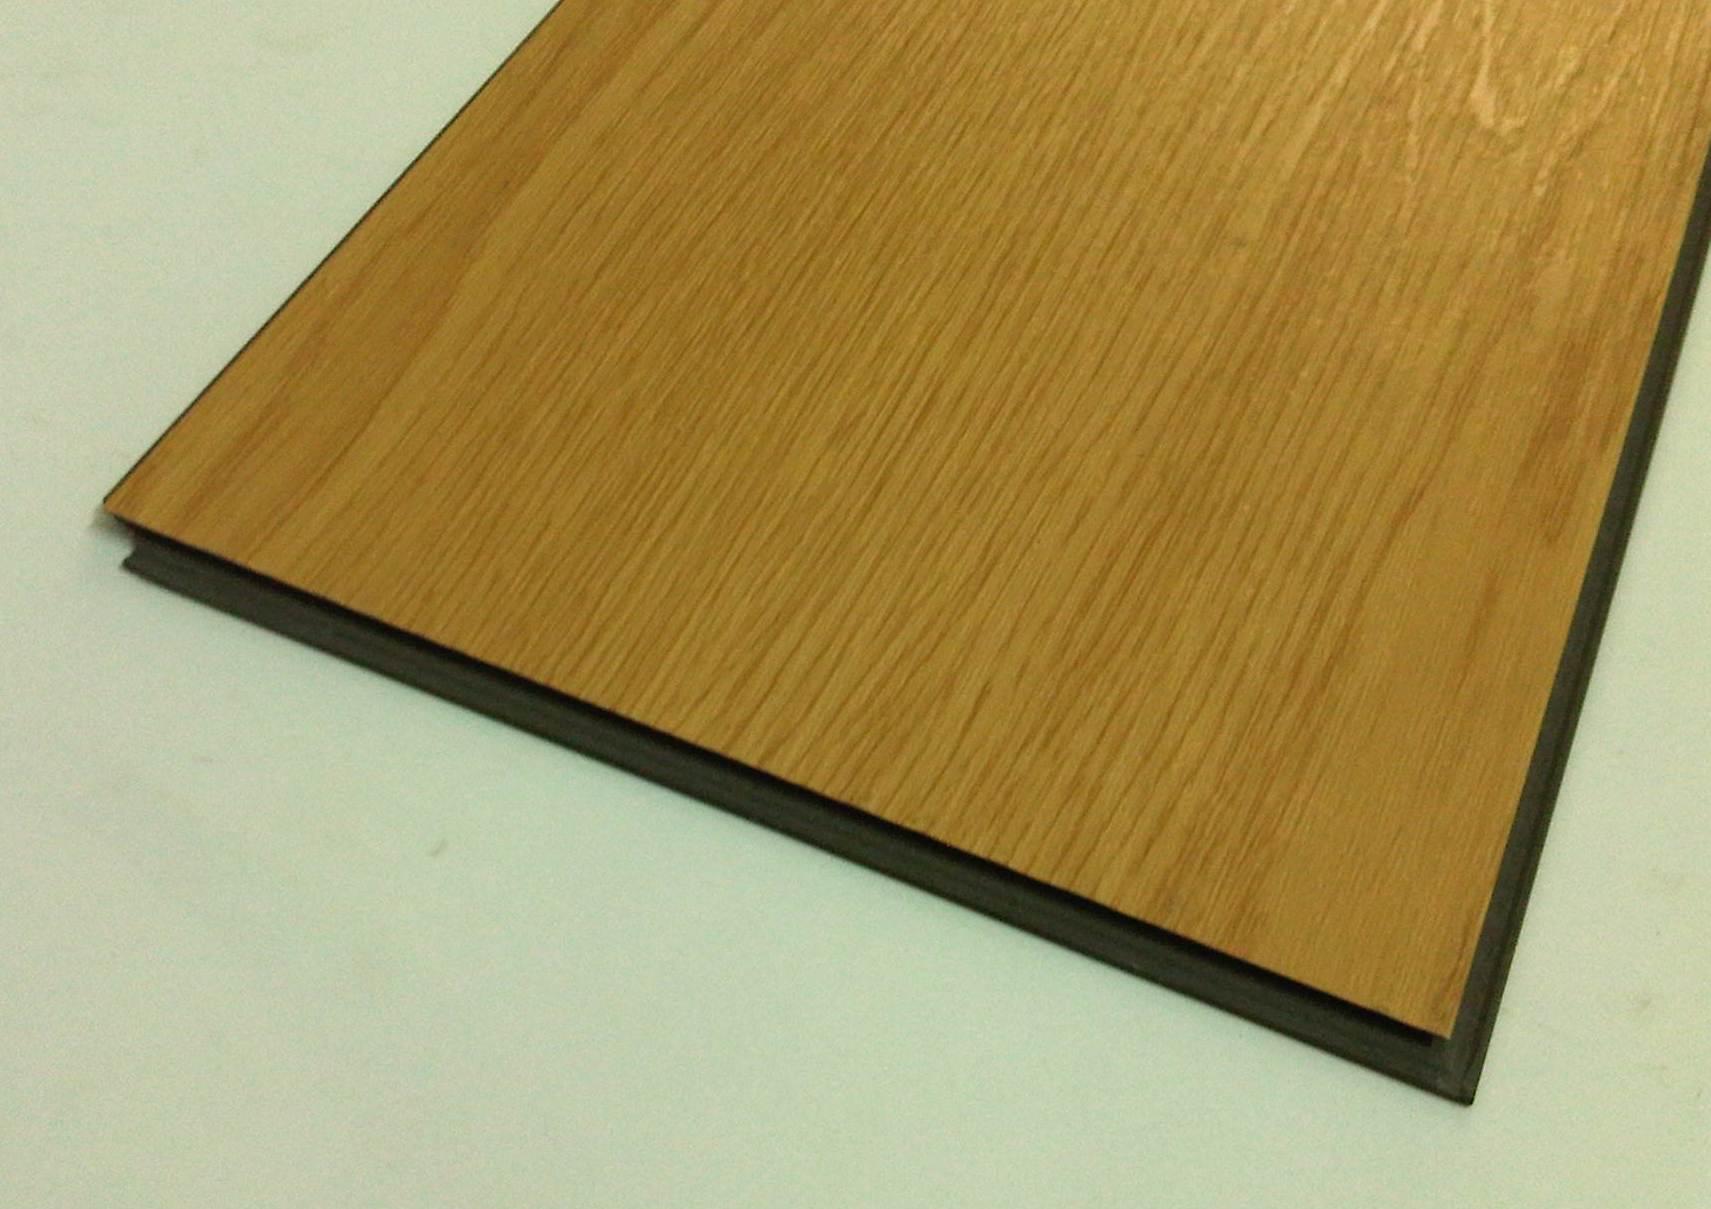 Sàn Nhựa Hèm Khóa Railflex RF420